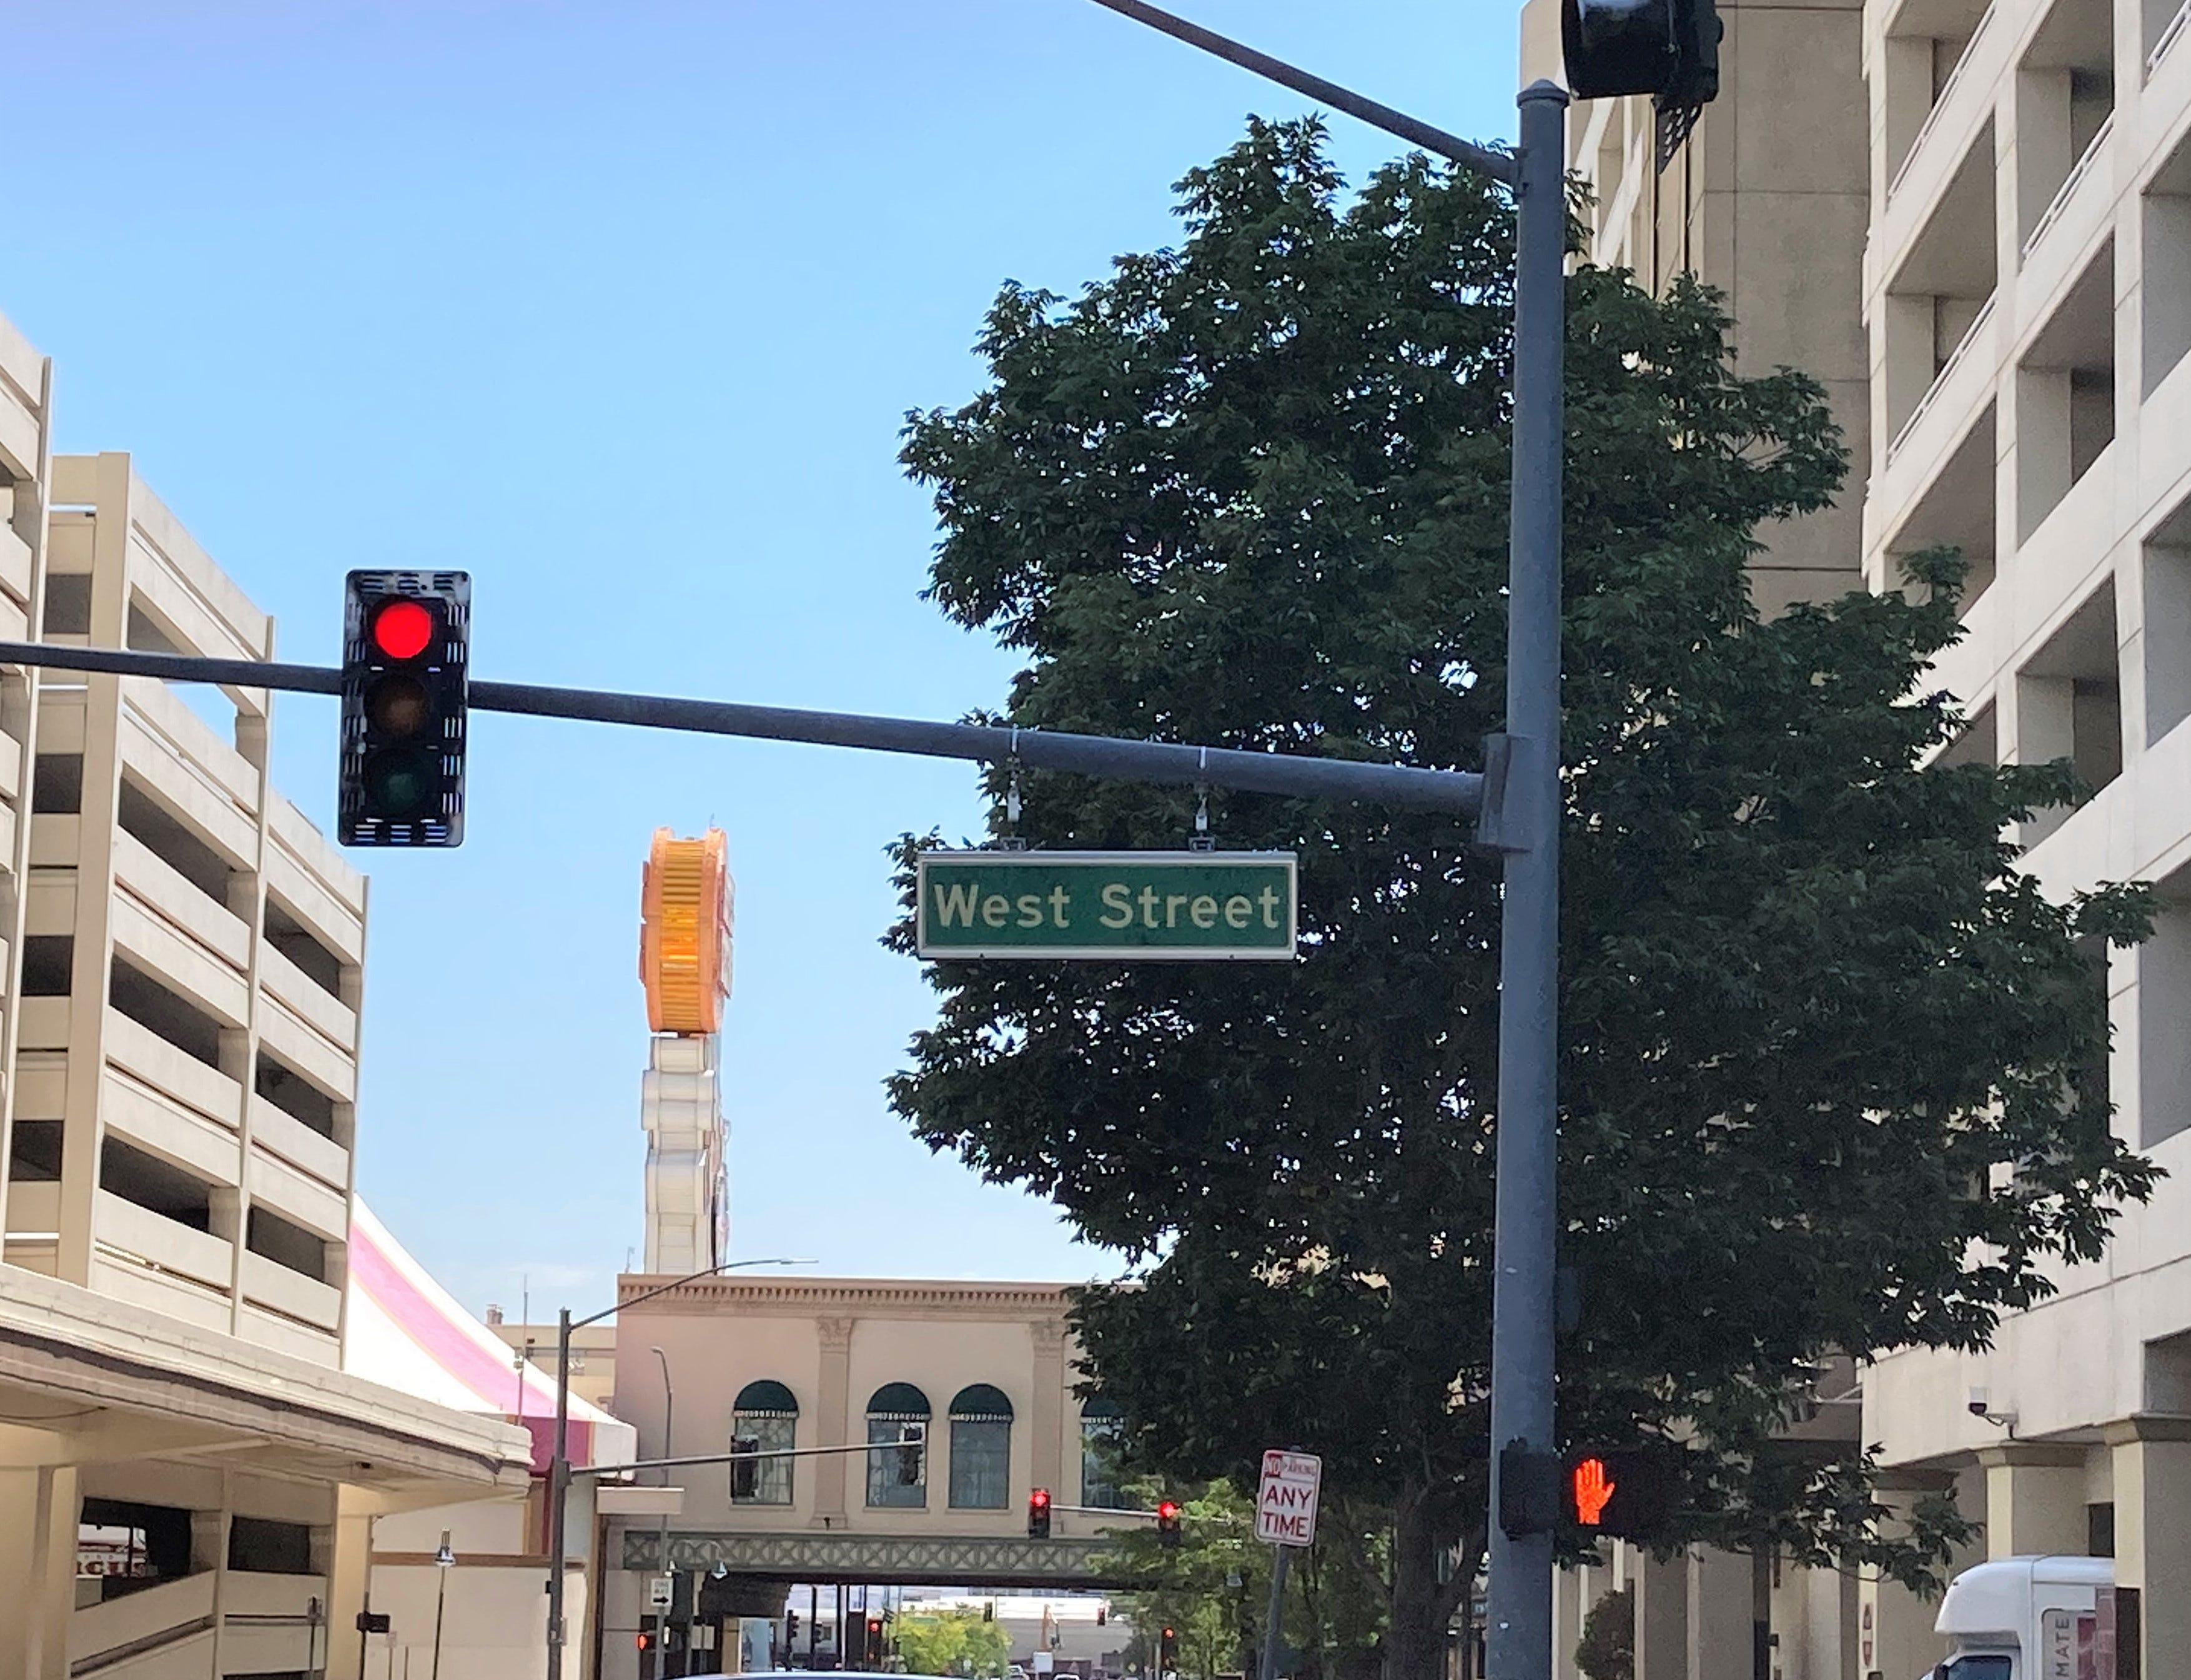 West Street in downtown Reno. Photo taken June 21, 2021.